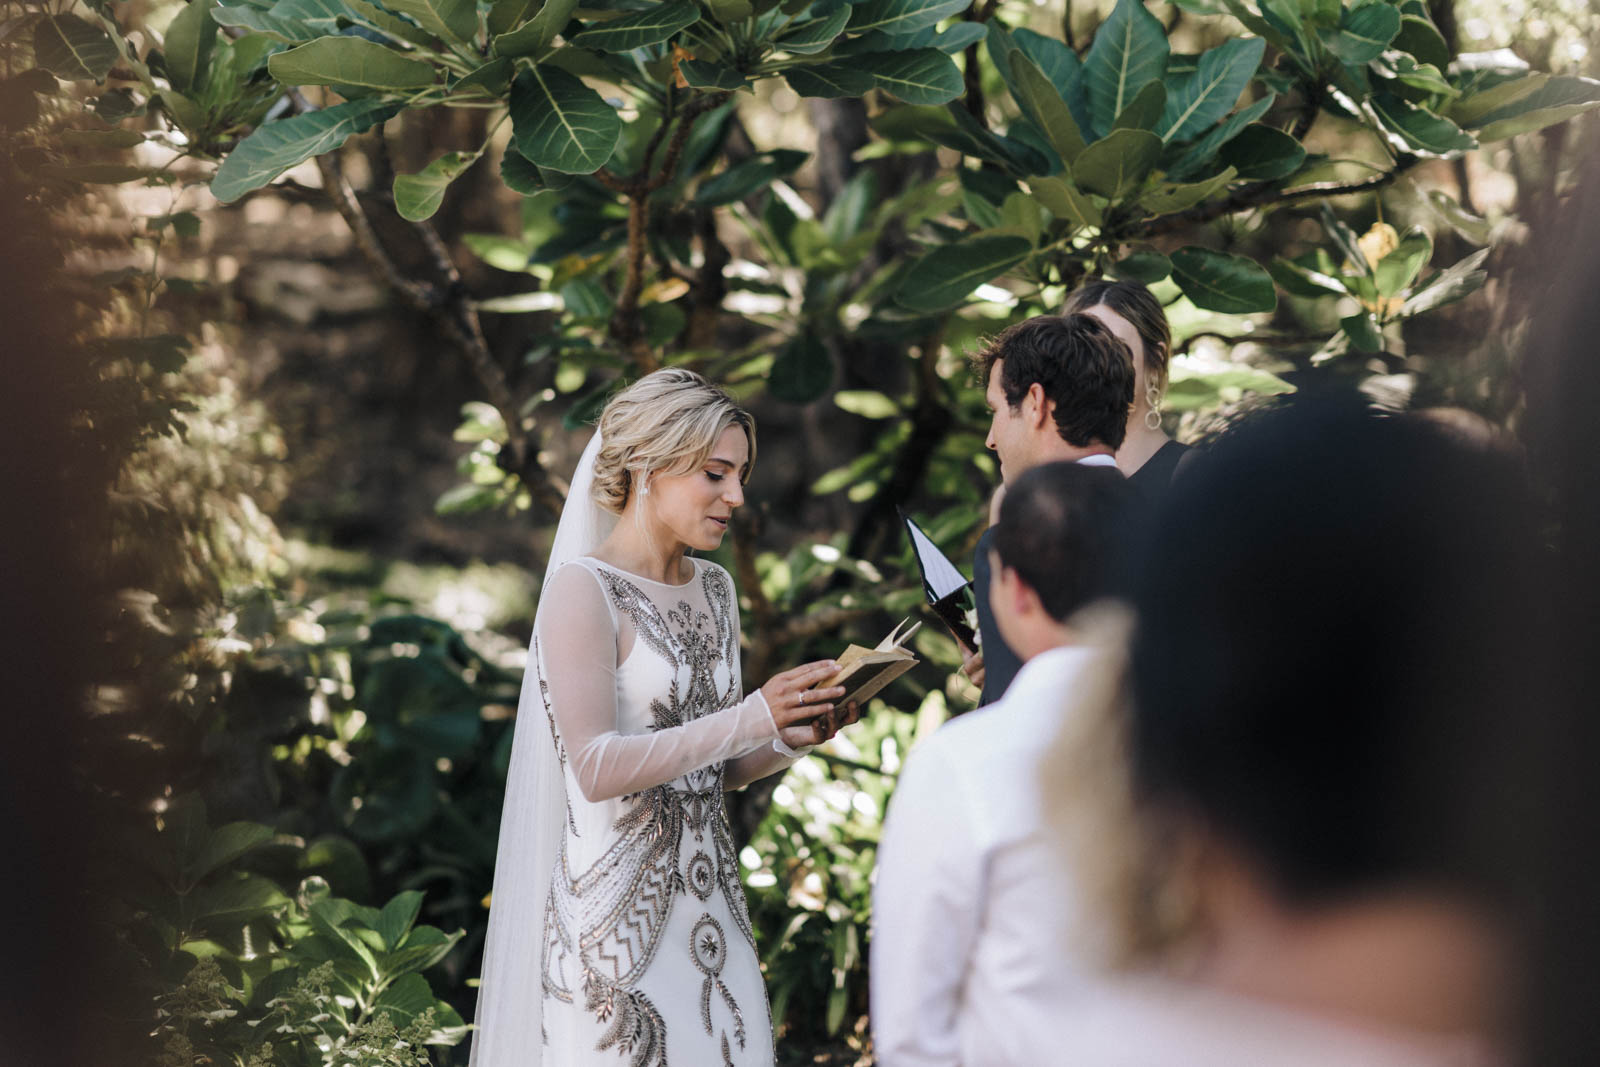 newfound-l-i-coromandel-wedding-photographer-1613-A9_02983